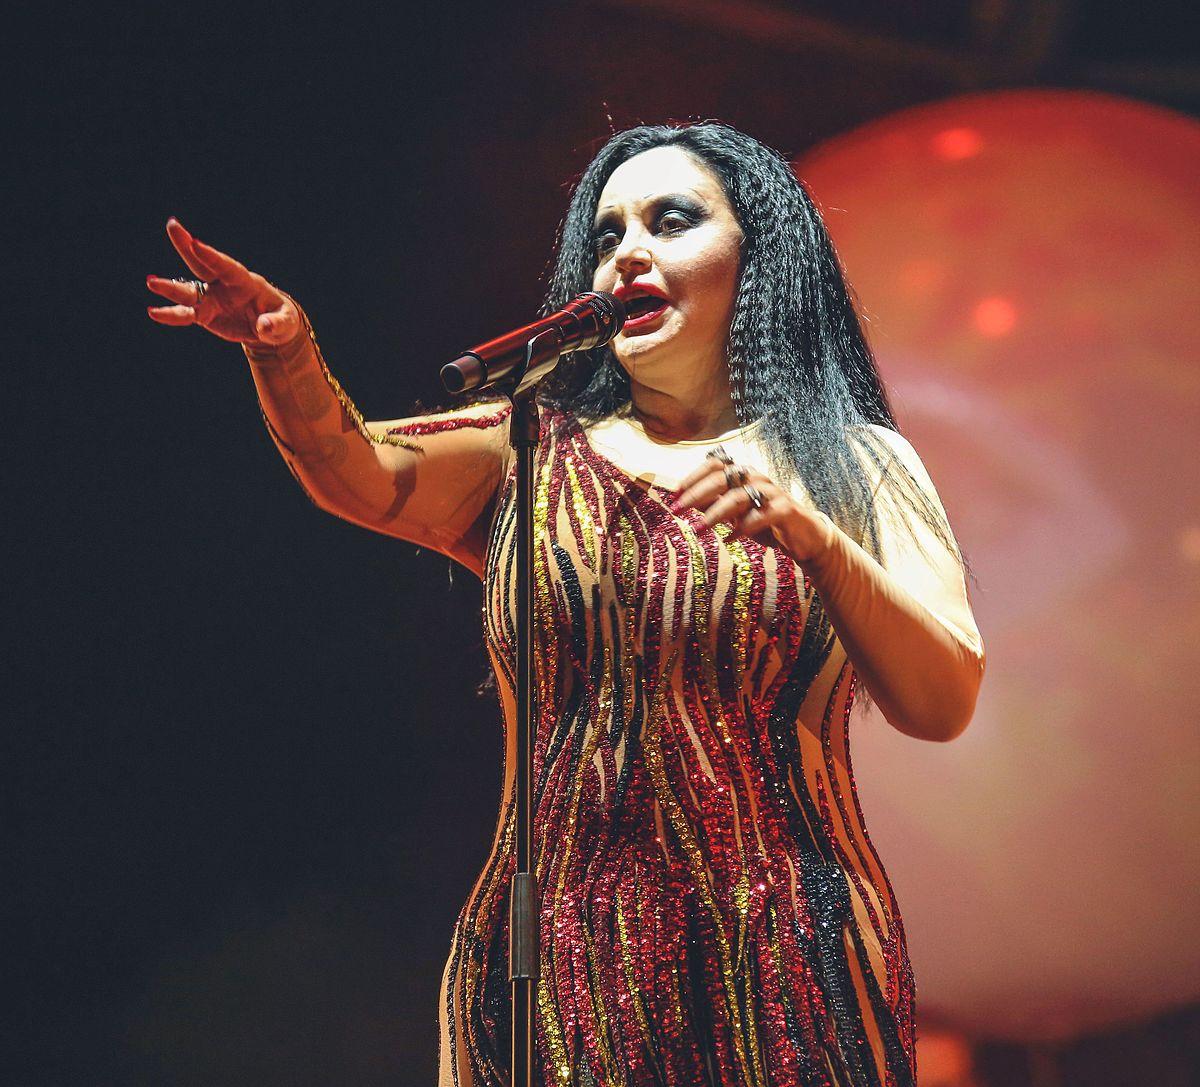 Alaska Cantante Wikipedia La Enciclopedia Libre